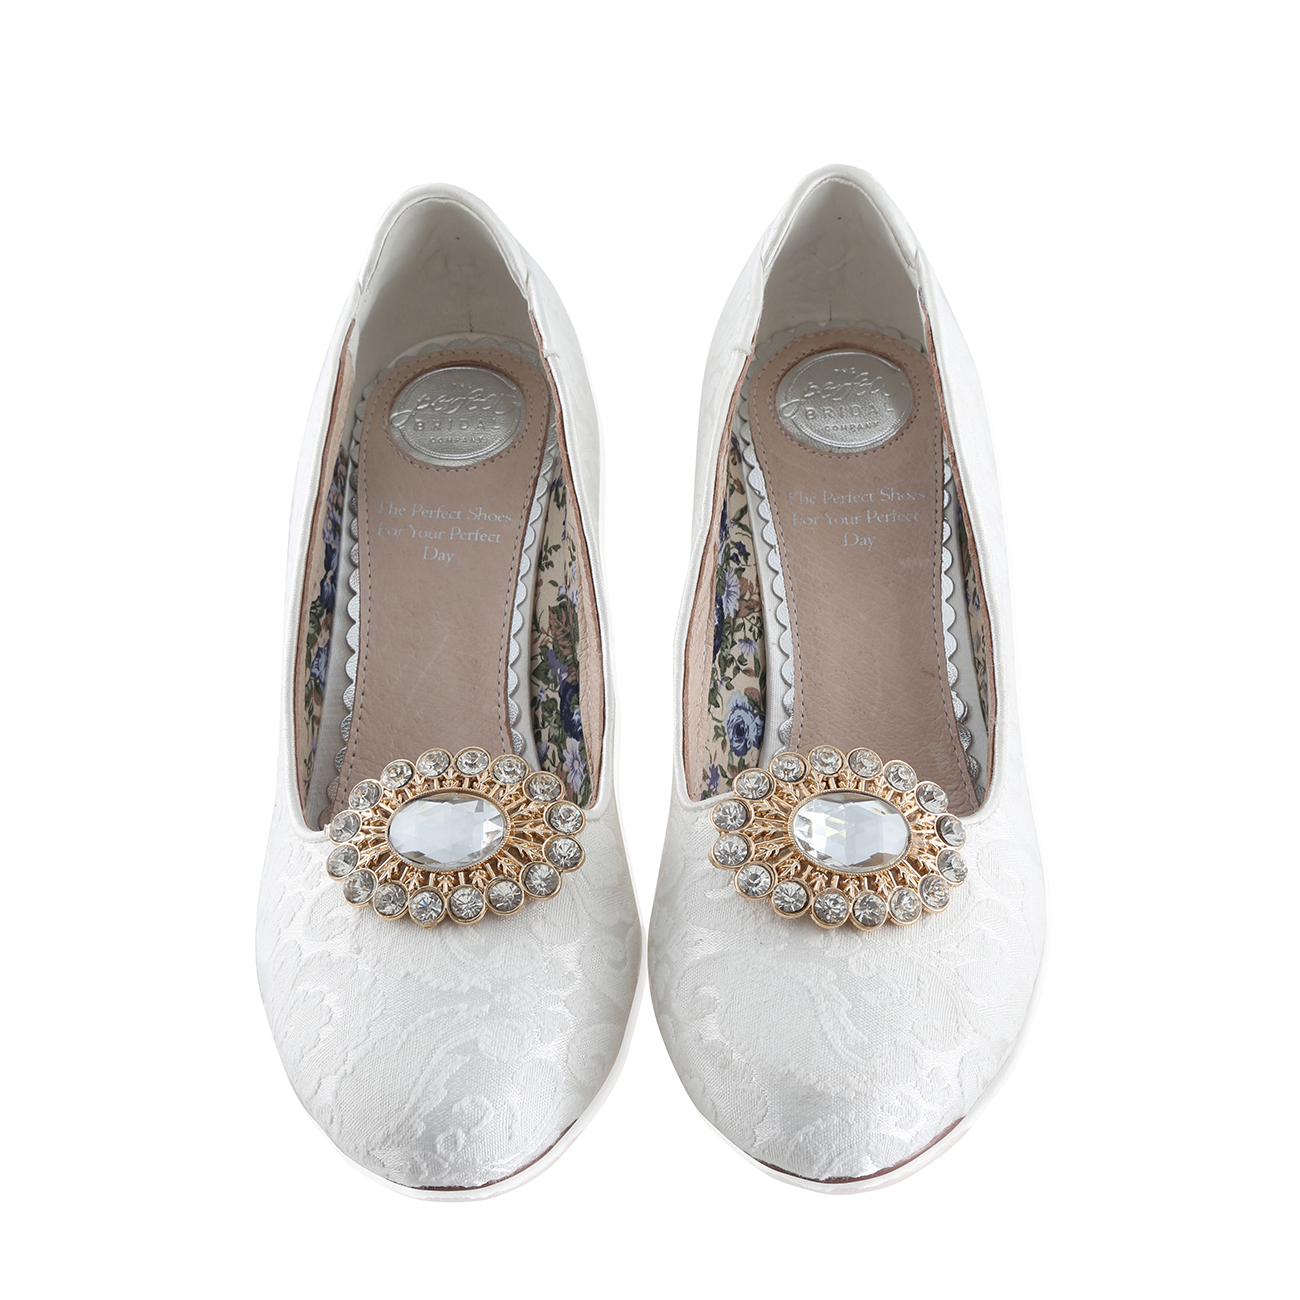 e1c7e31bd pear - Perfect Shoe Clips - The Perfect Bridal Company